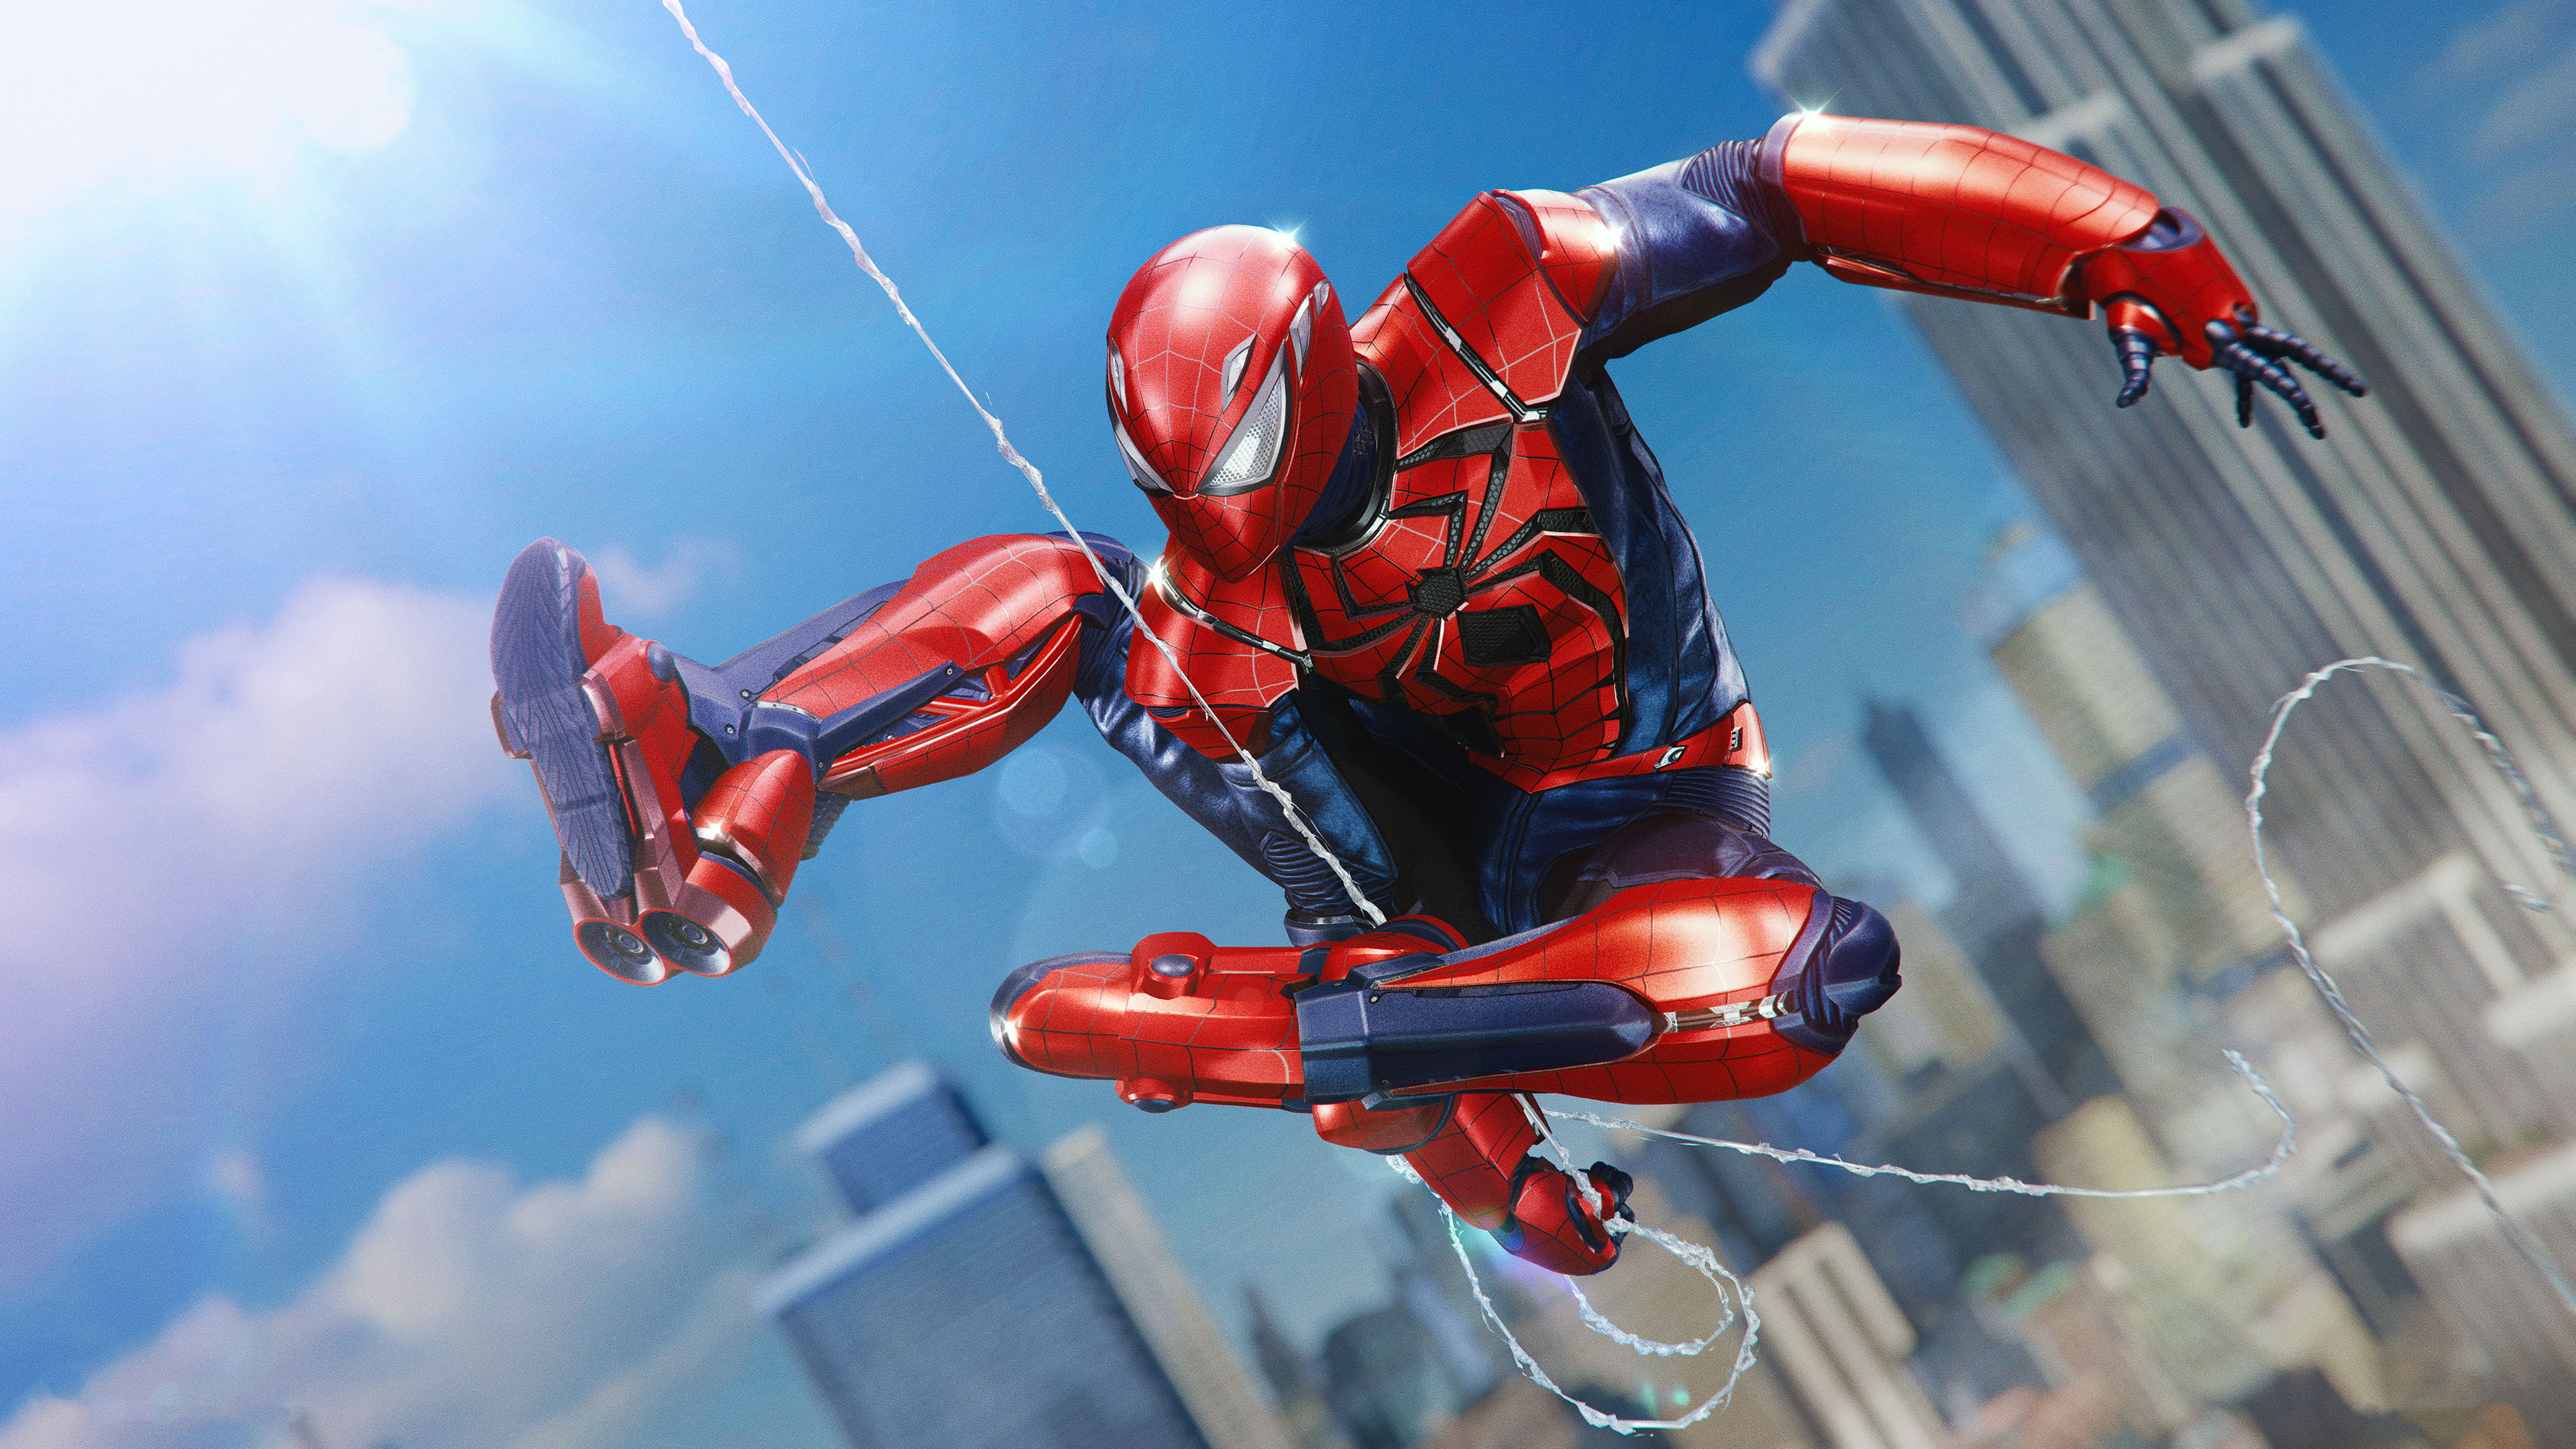 marvel spider man 4k 1544923258 - Marvel Spider Man 4k - superheroes wallpapers, spiderman wallpapers, spiderman ps4 wallpapers, ps games wallpapers, marvel wallpapers, hd-wallpapers, games wallpapers, 4k-wallpapers, 2018 games wallpapers